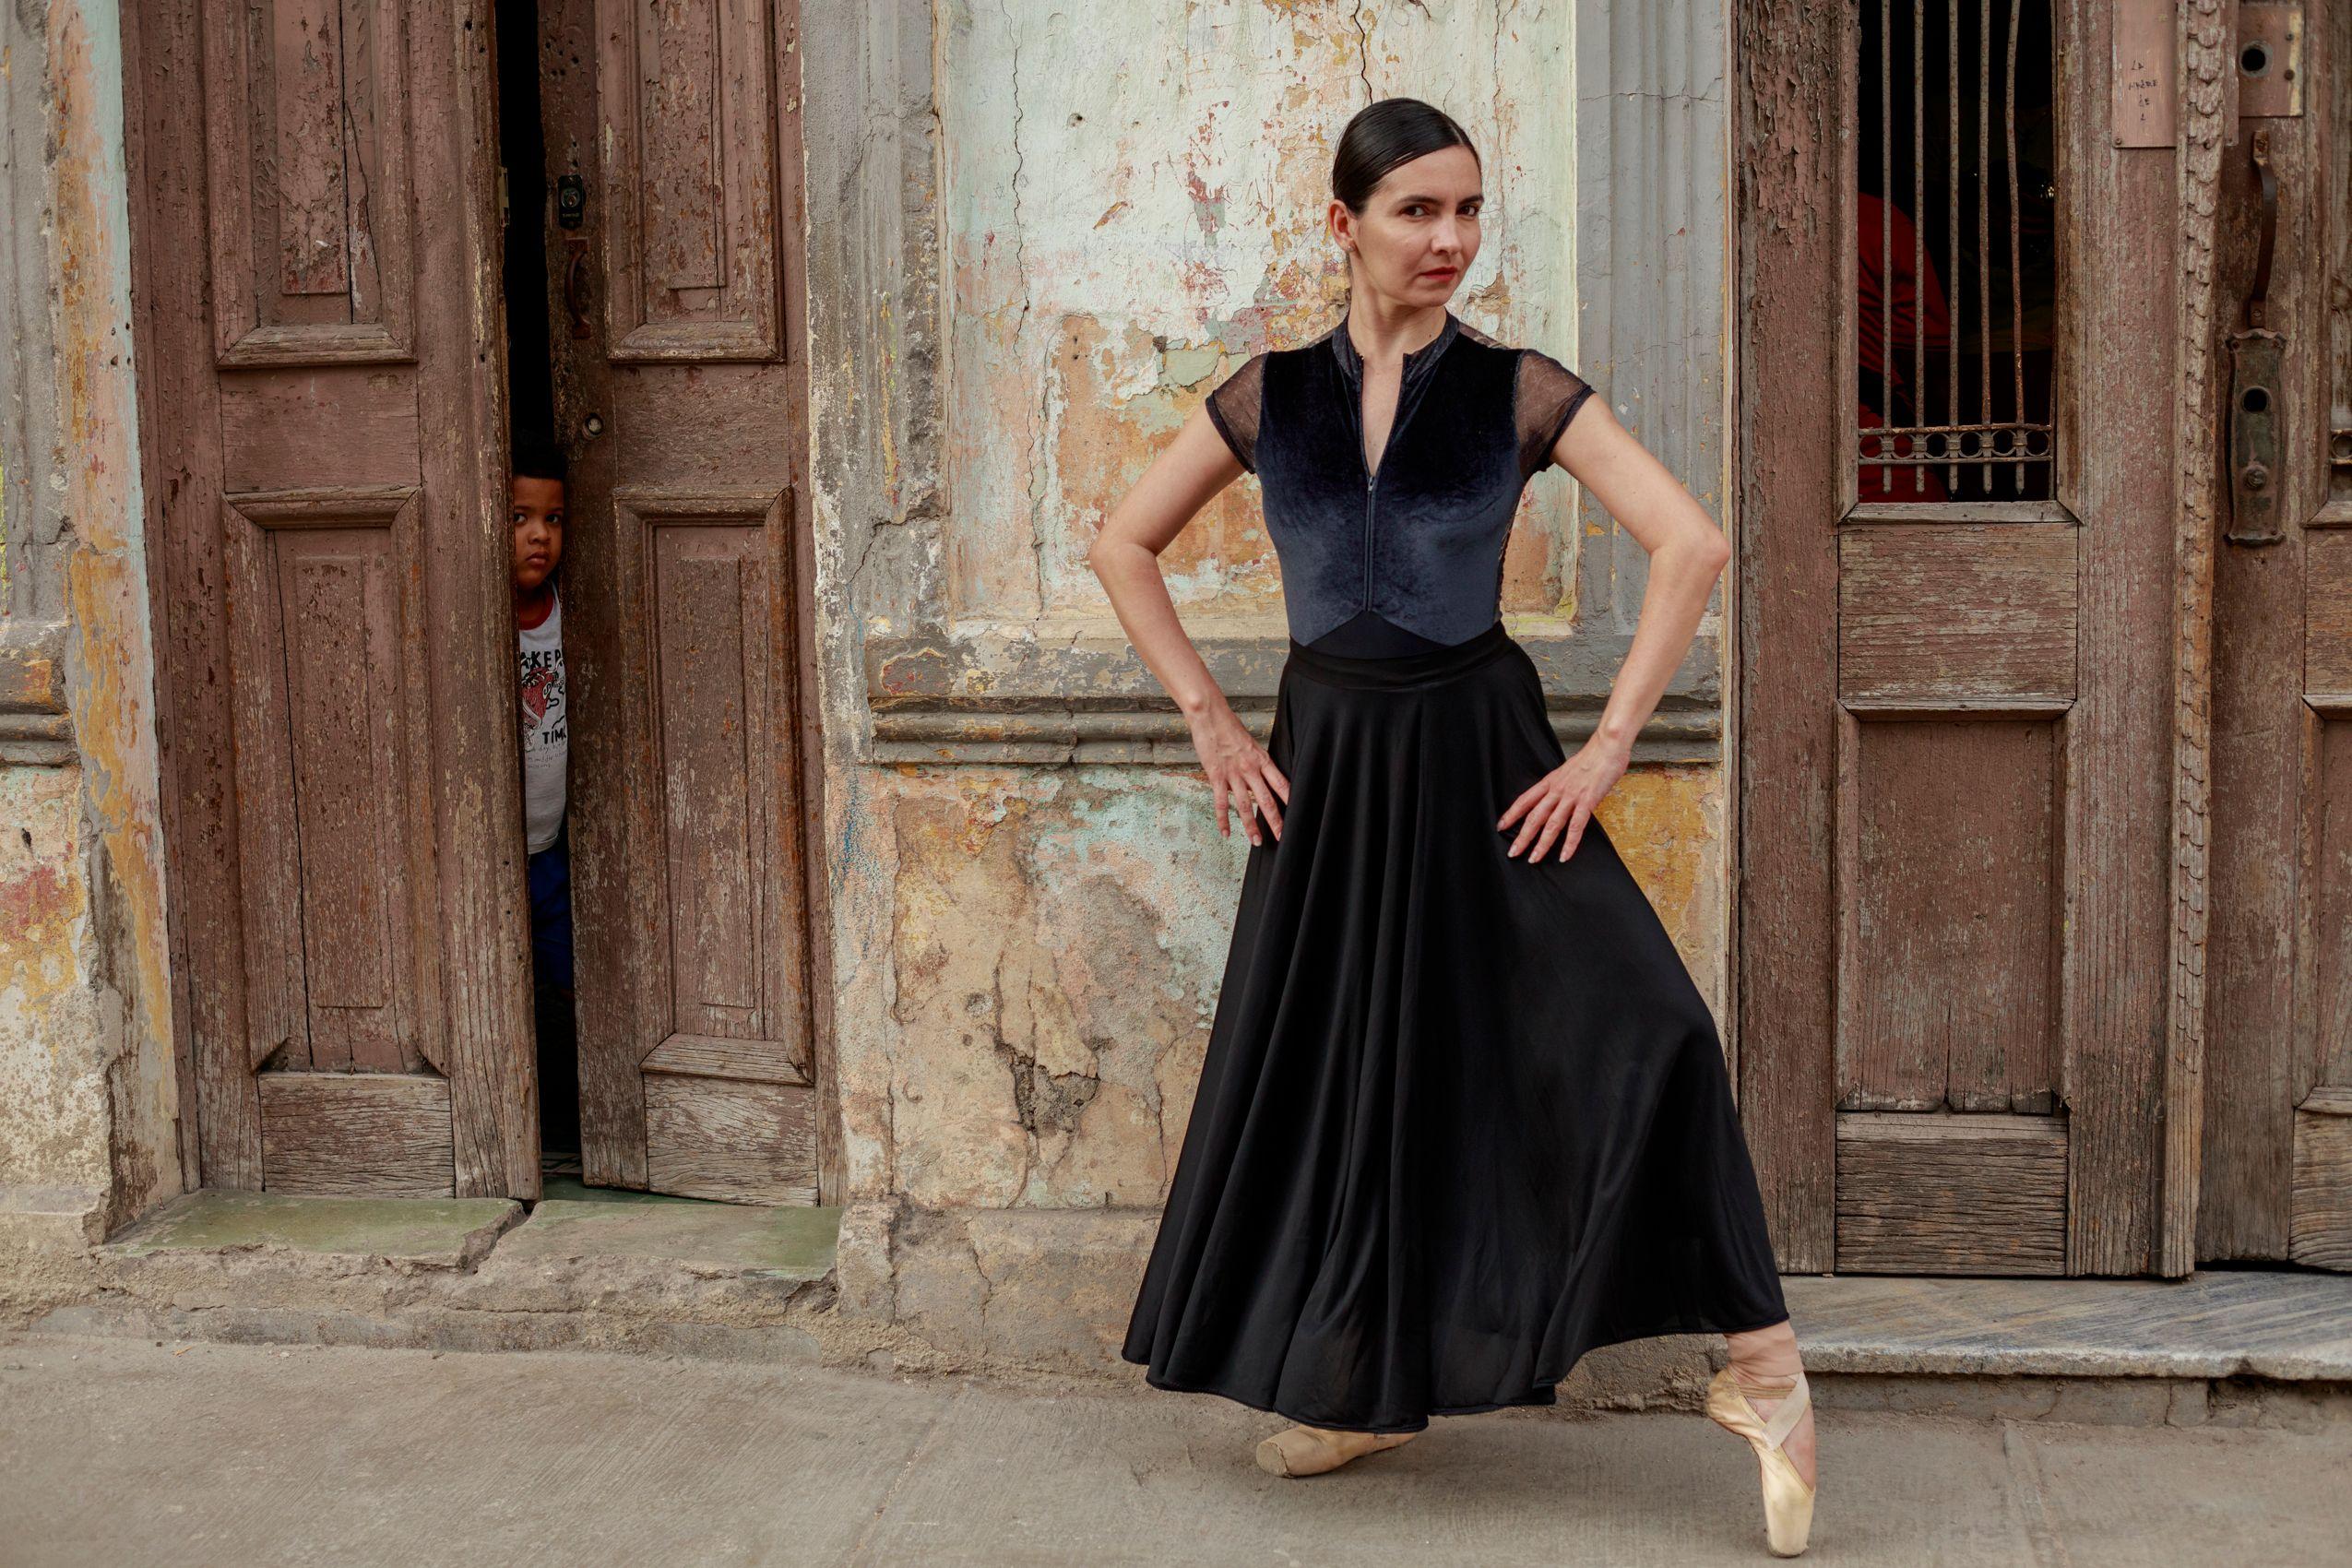 Cuban ballerina. Habana Vieja.